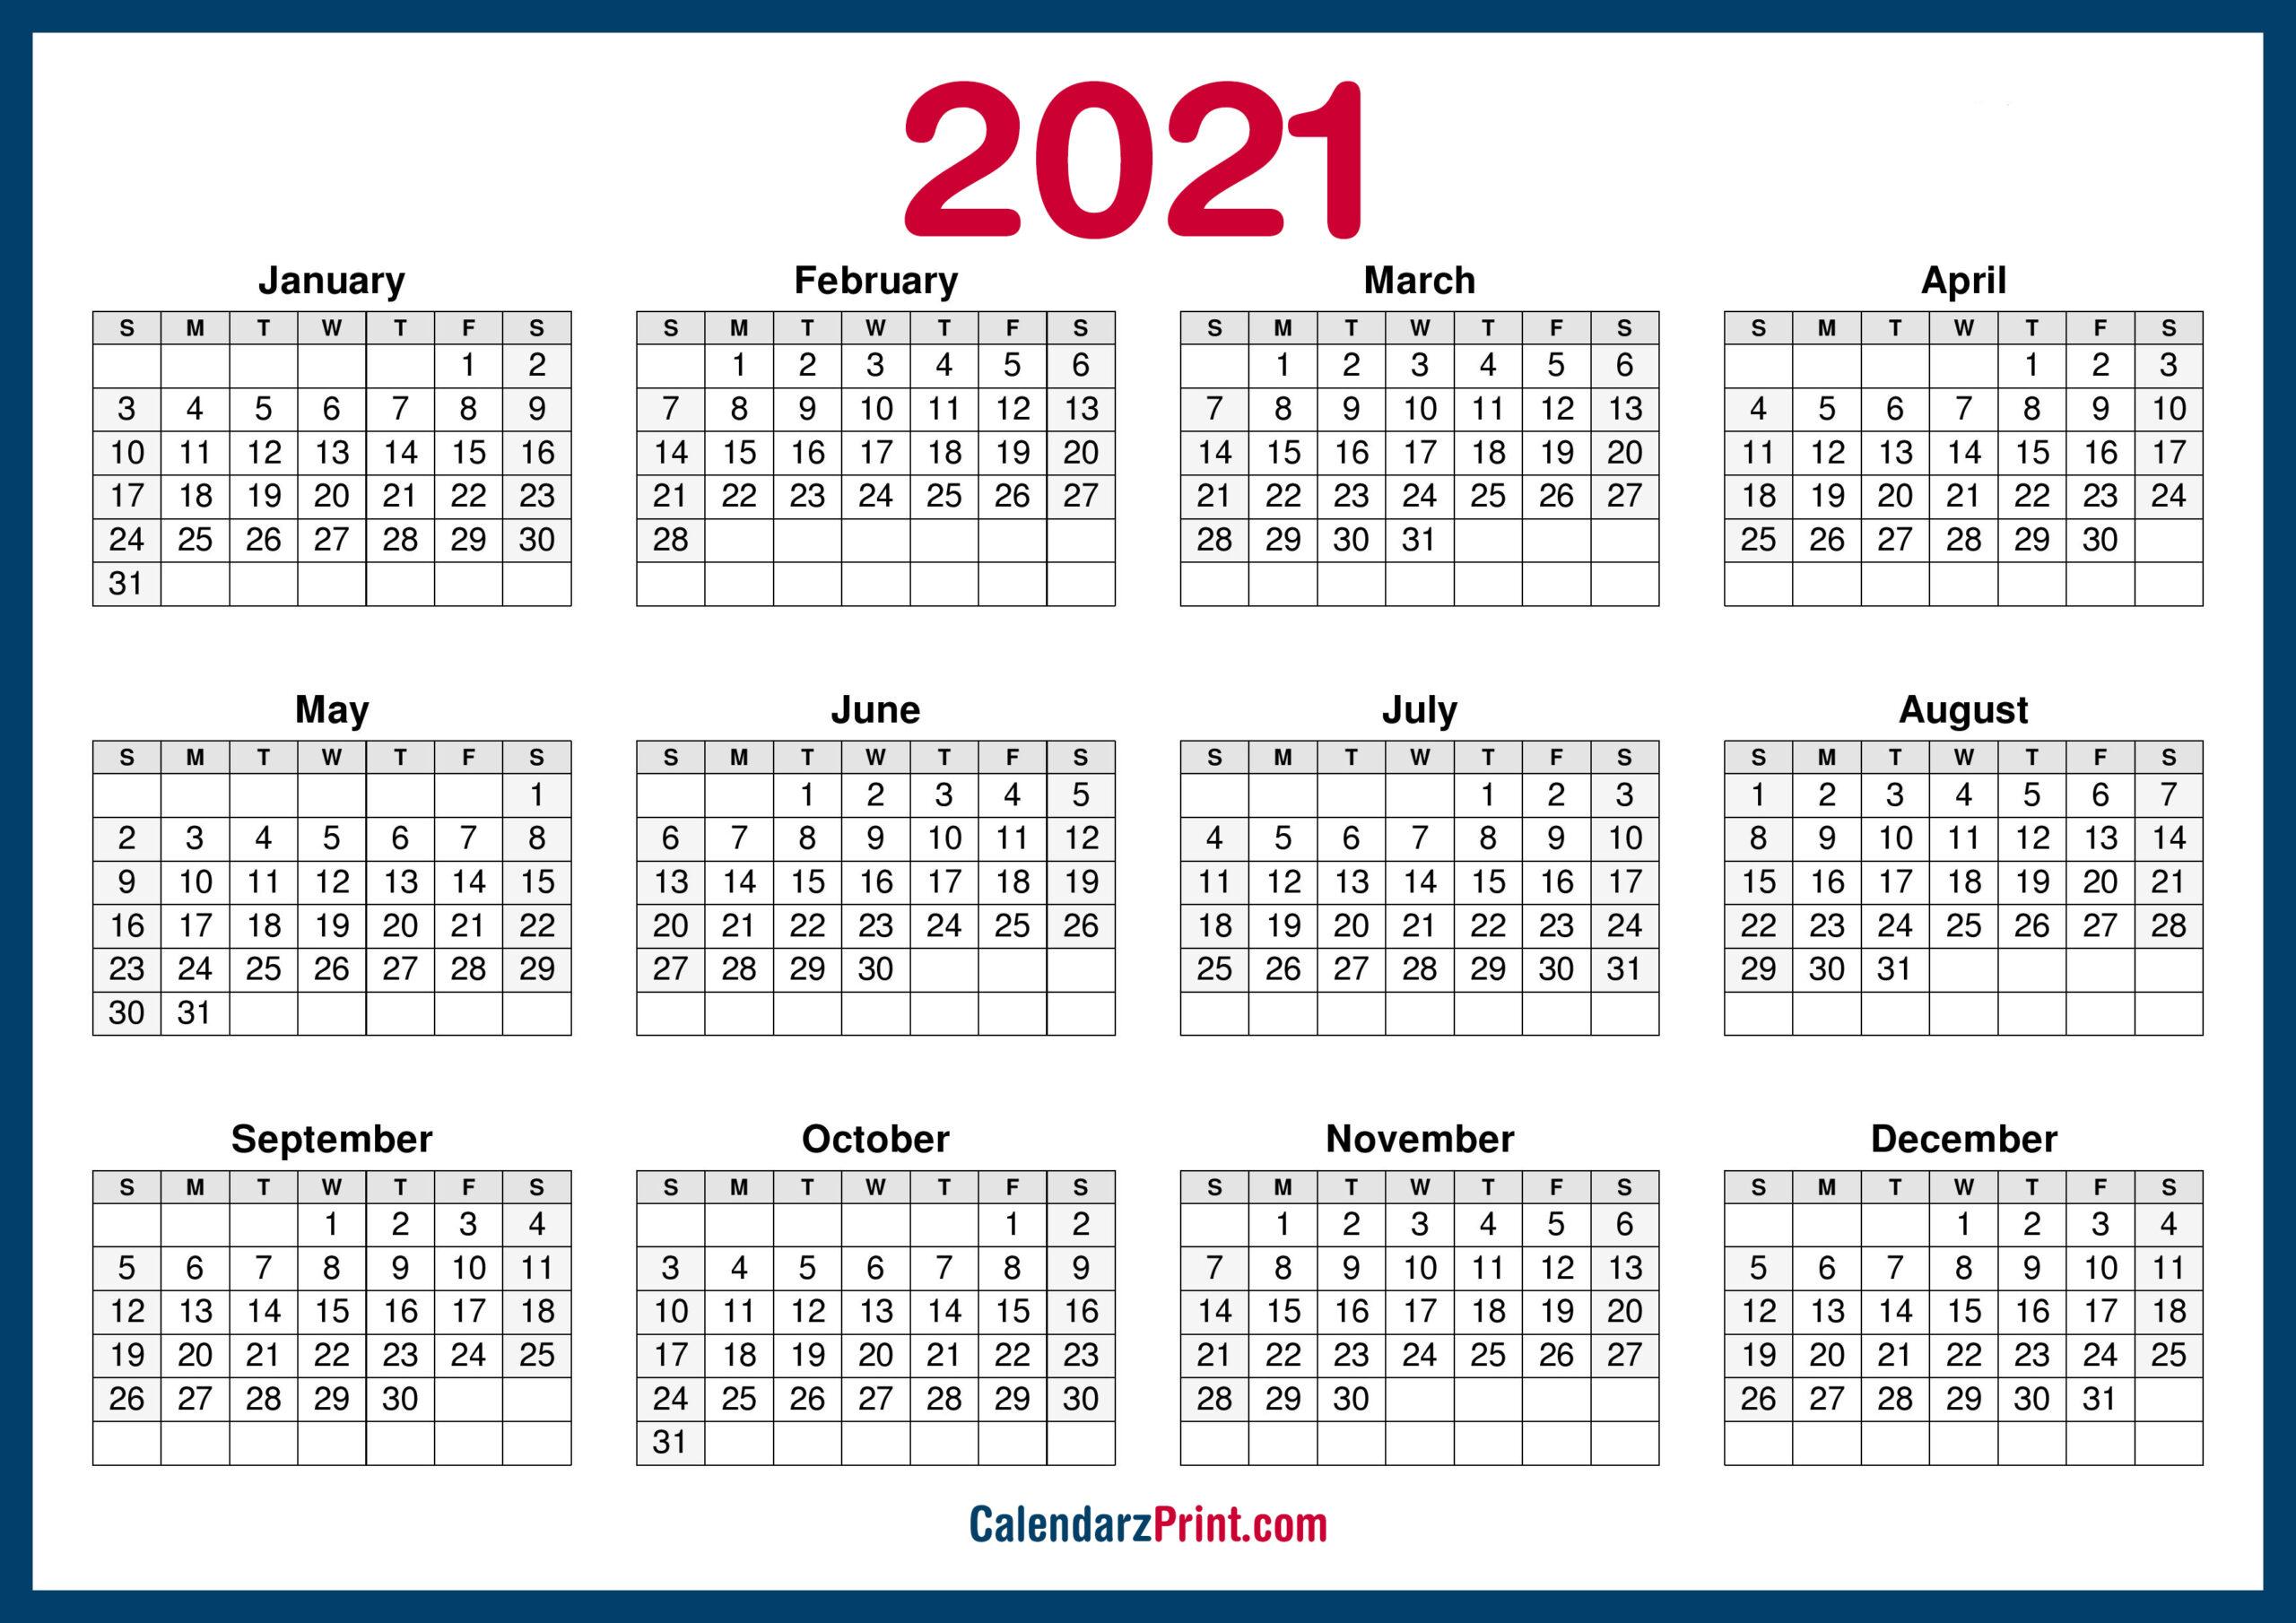 2021 Calendar Printable Free, Horizontal, Hd, Navy Blue